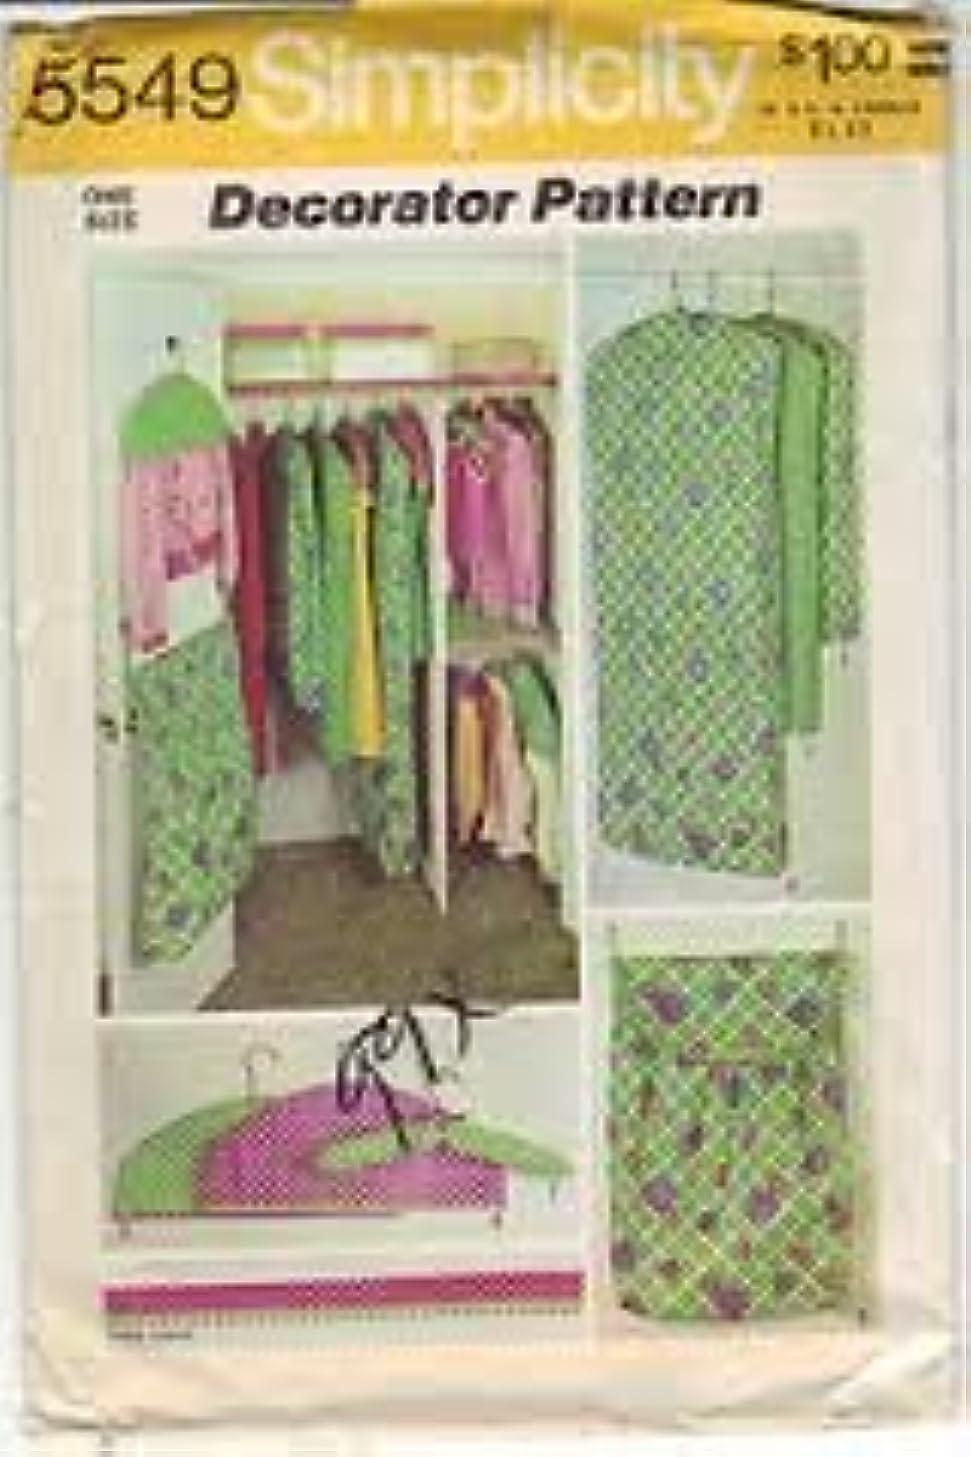 Simplicity 5549 Decorator Pattern Set of Closet Organizers